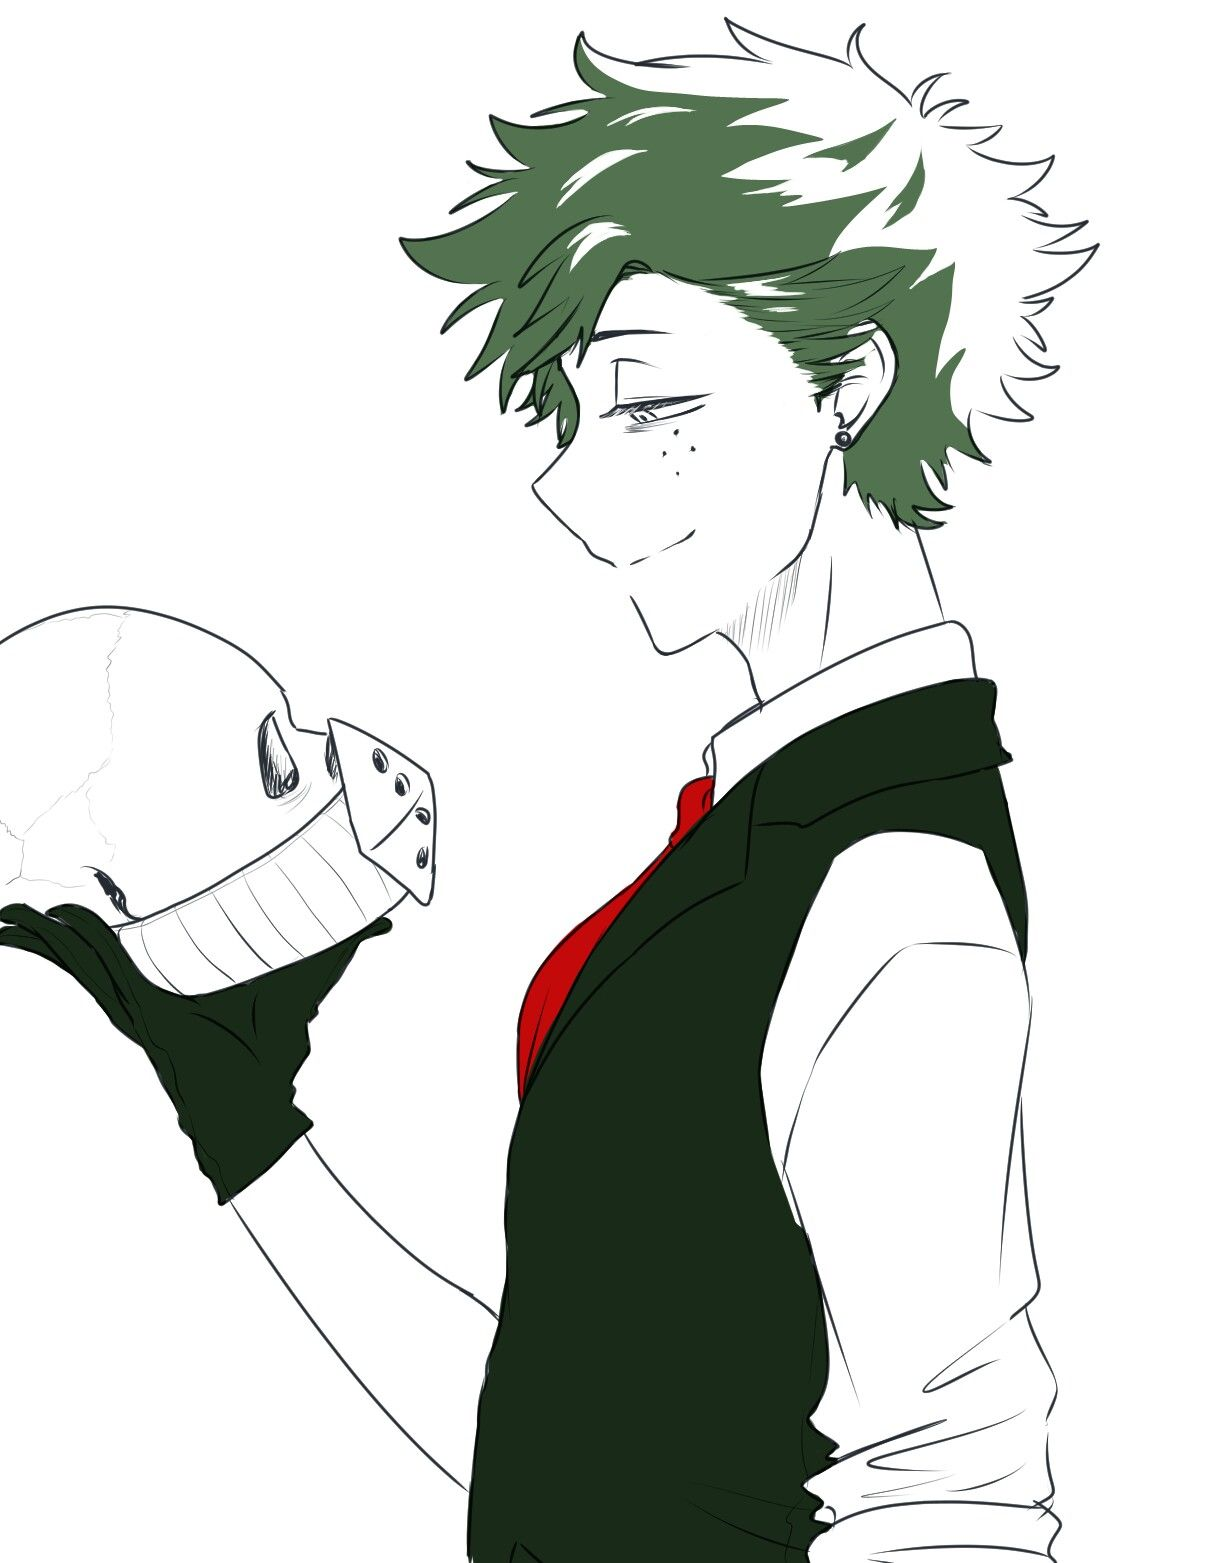 Who S The Damsel In Distress Now How Unfortunate Villain Deku Anime Villians Yandere Manga